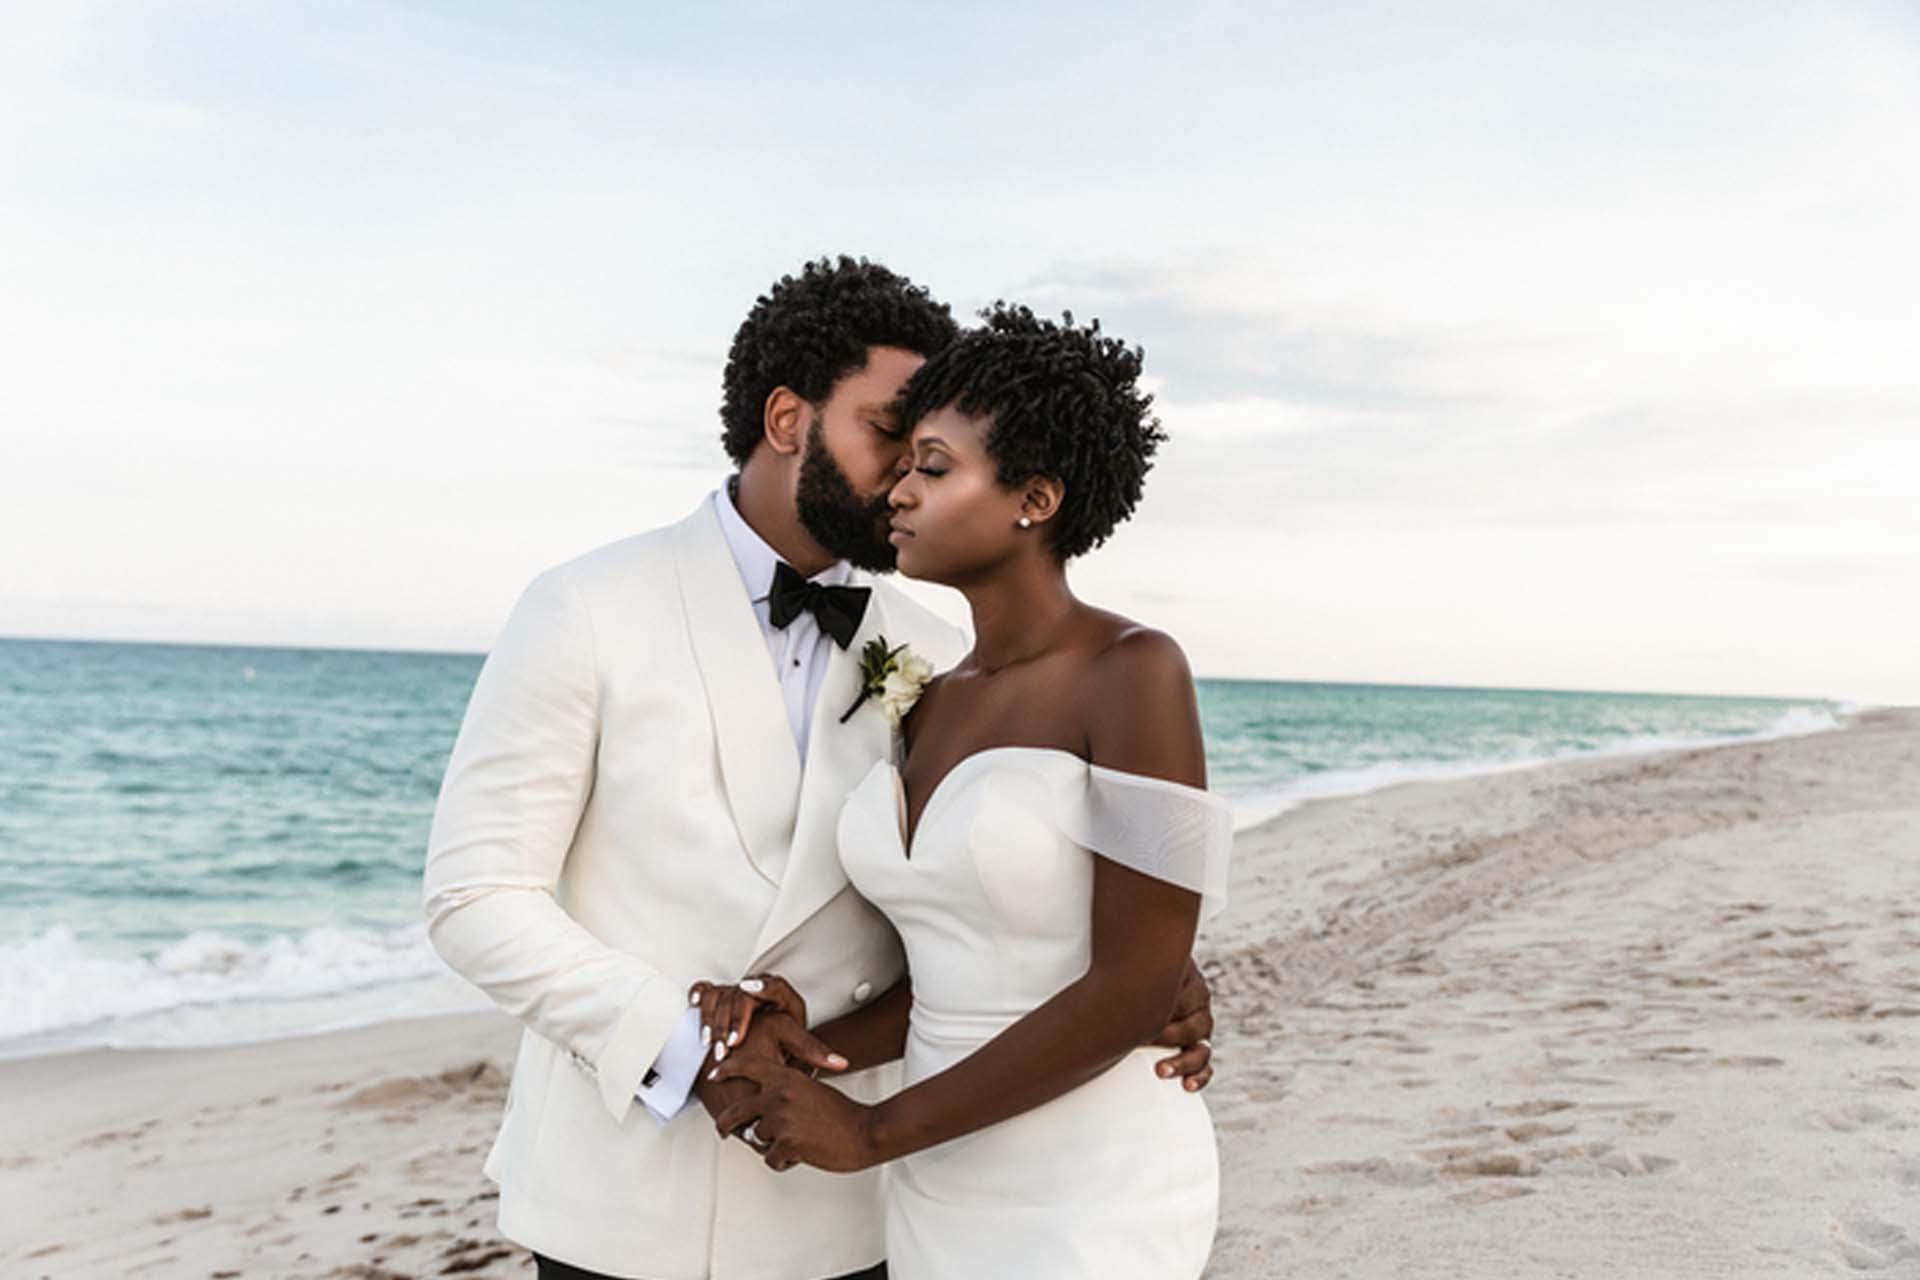 Debt-free wedding and honeymoon